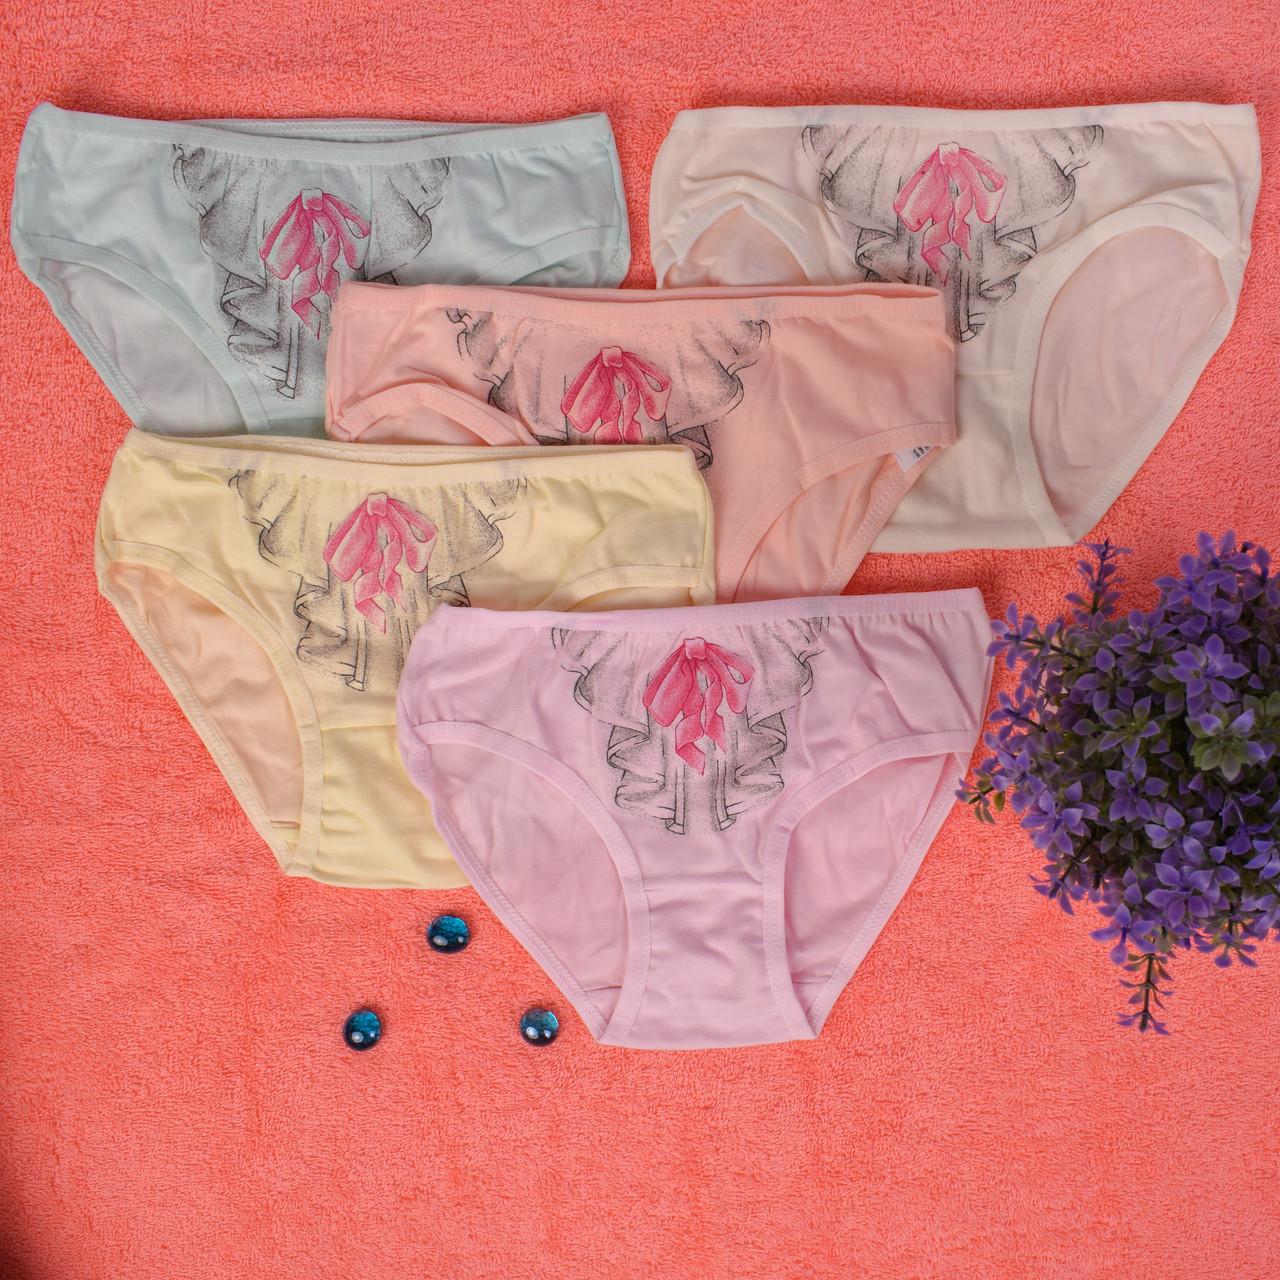 Детские трусики для девочки Турция. Donella 4171WVF. Размер на 10-11 л